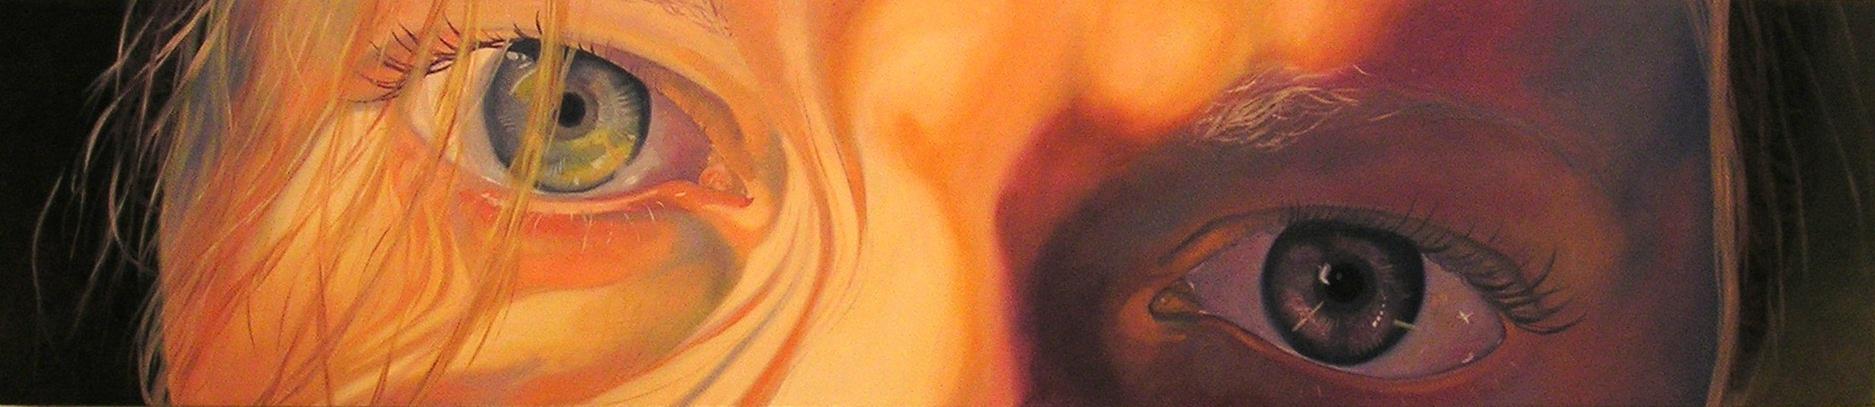 "Self portrait, 12x40"", oil on panel, 2005"